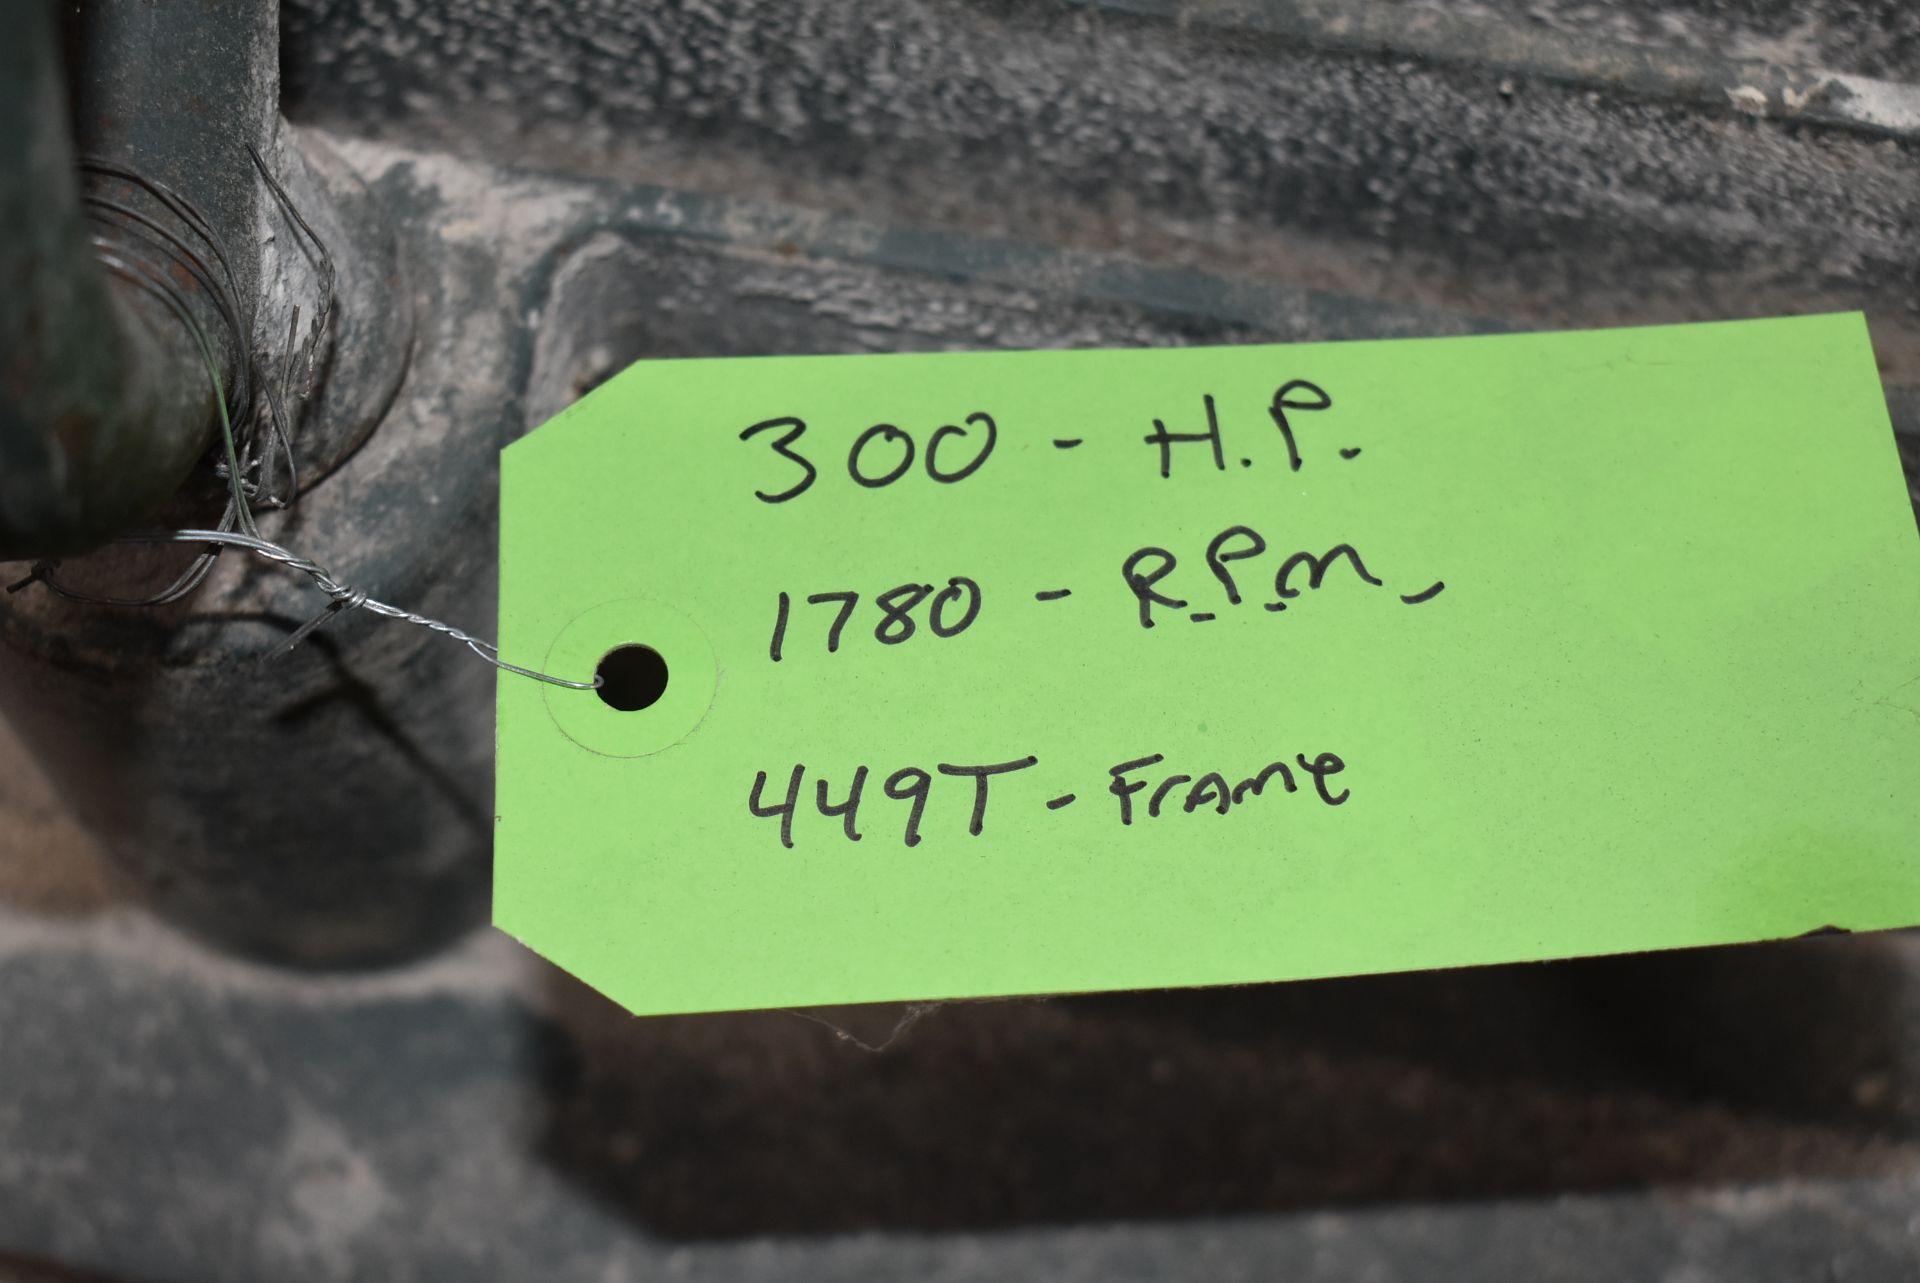 Bird 300 HP Motor, 1780 RPM - Image 3 of 4